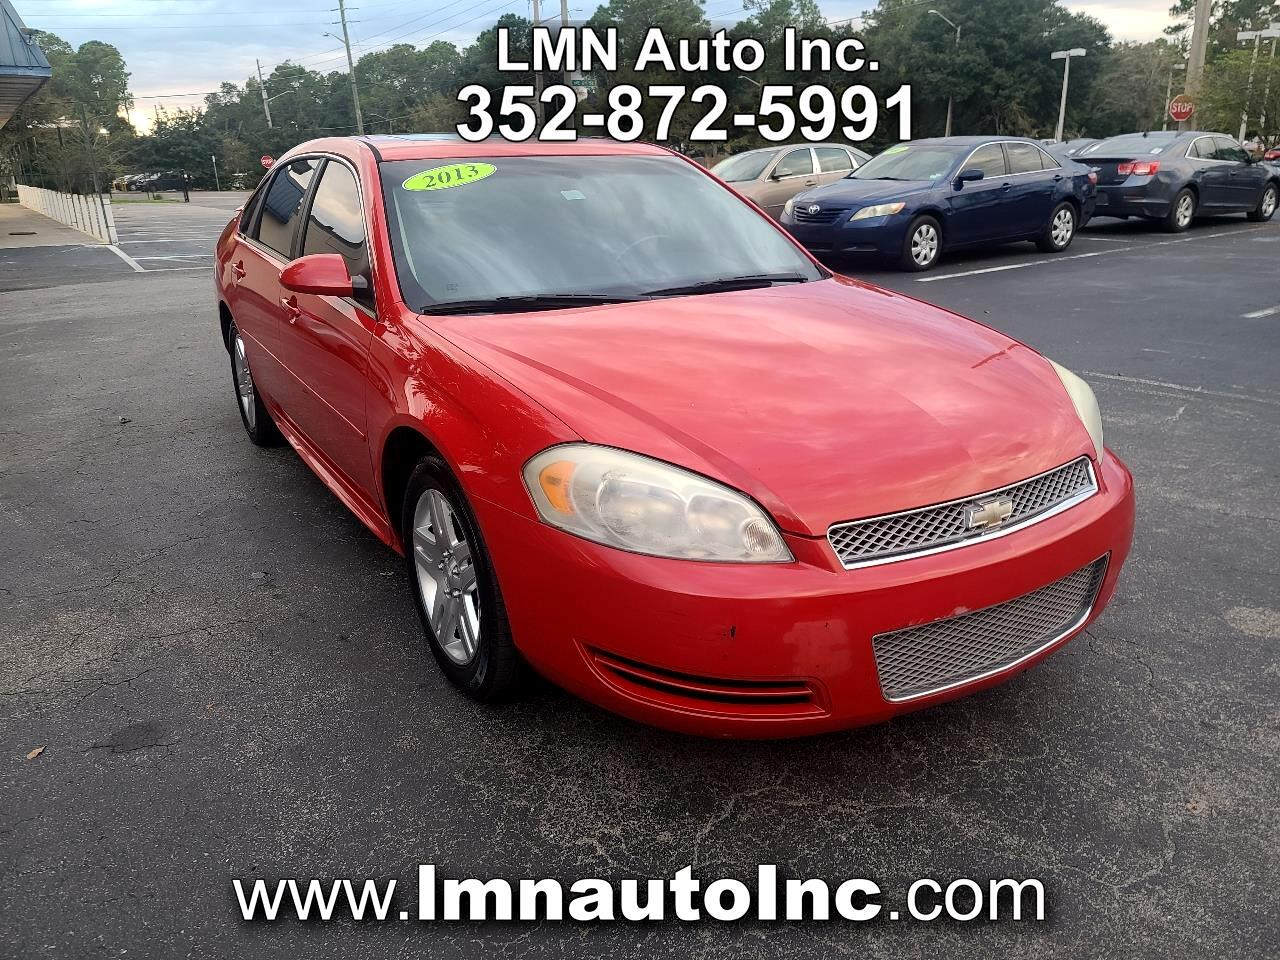 Chevrolet Impala 4dr Sdn LT Fleet 2013